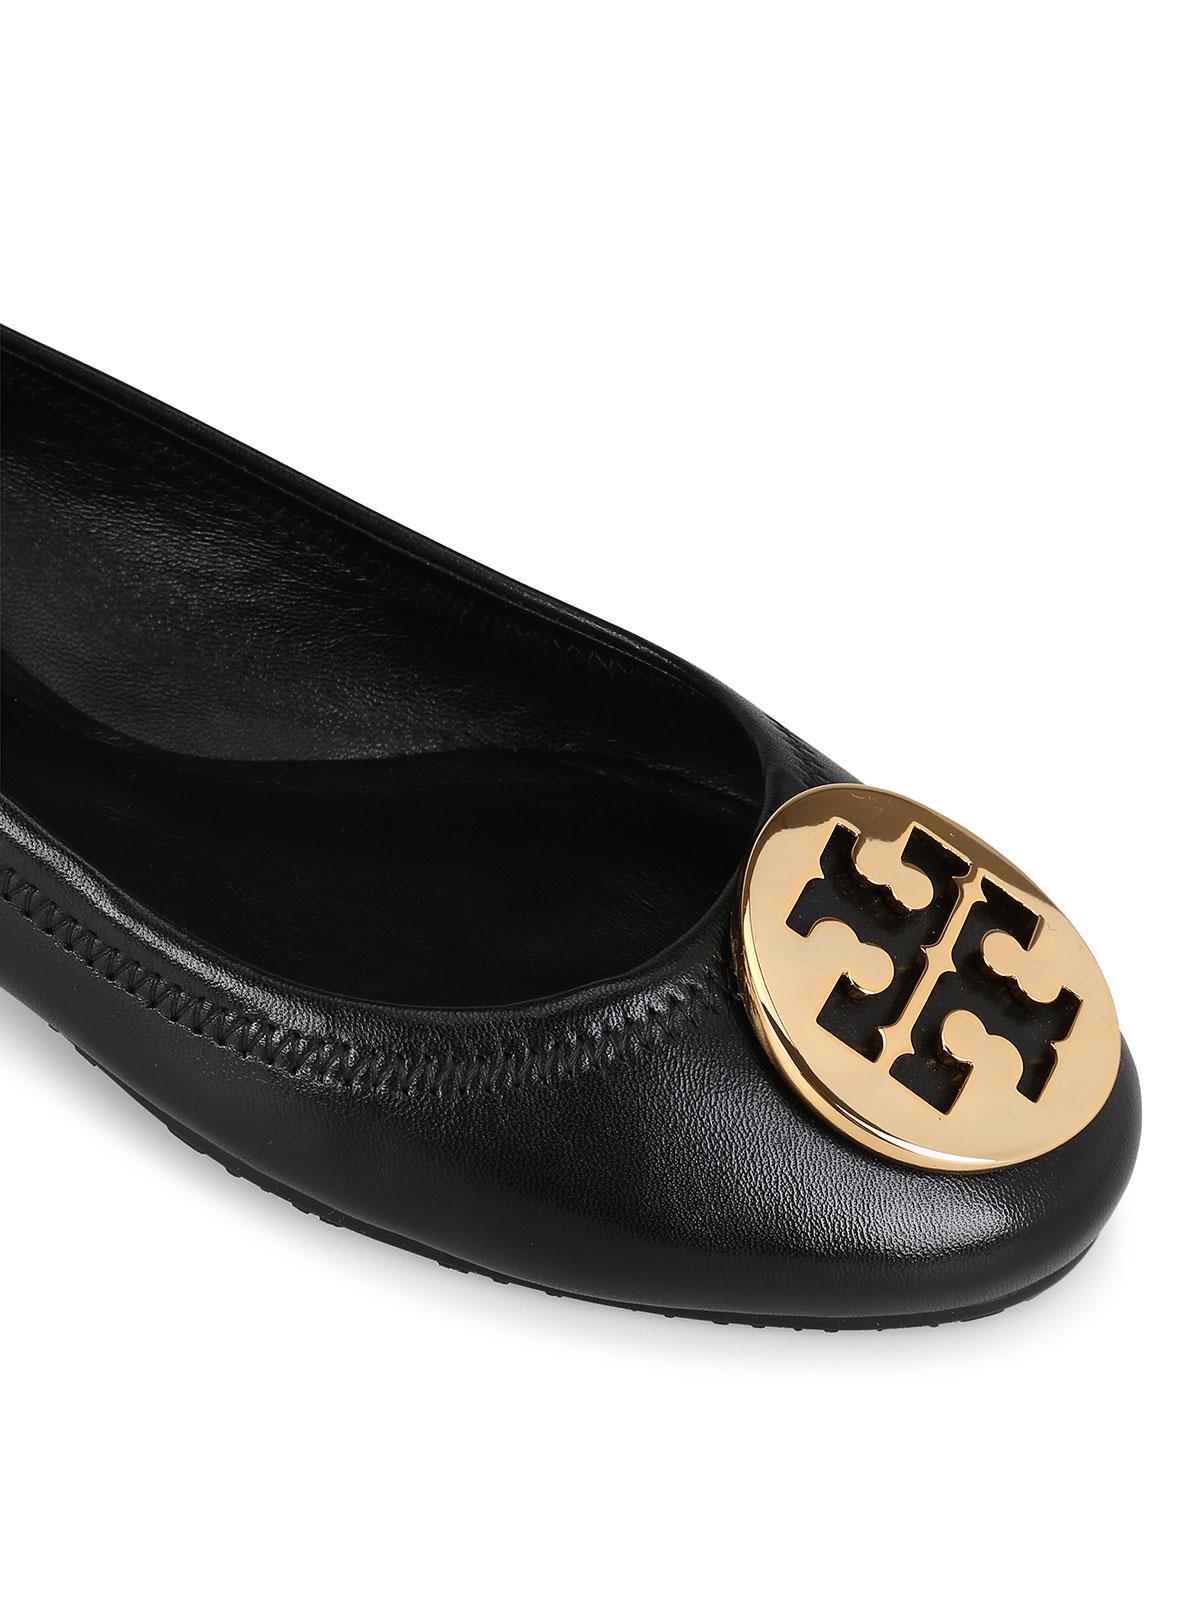 iKRIX Tory Burch: flat shoes - Reva Ballet Mestico flats